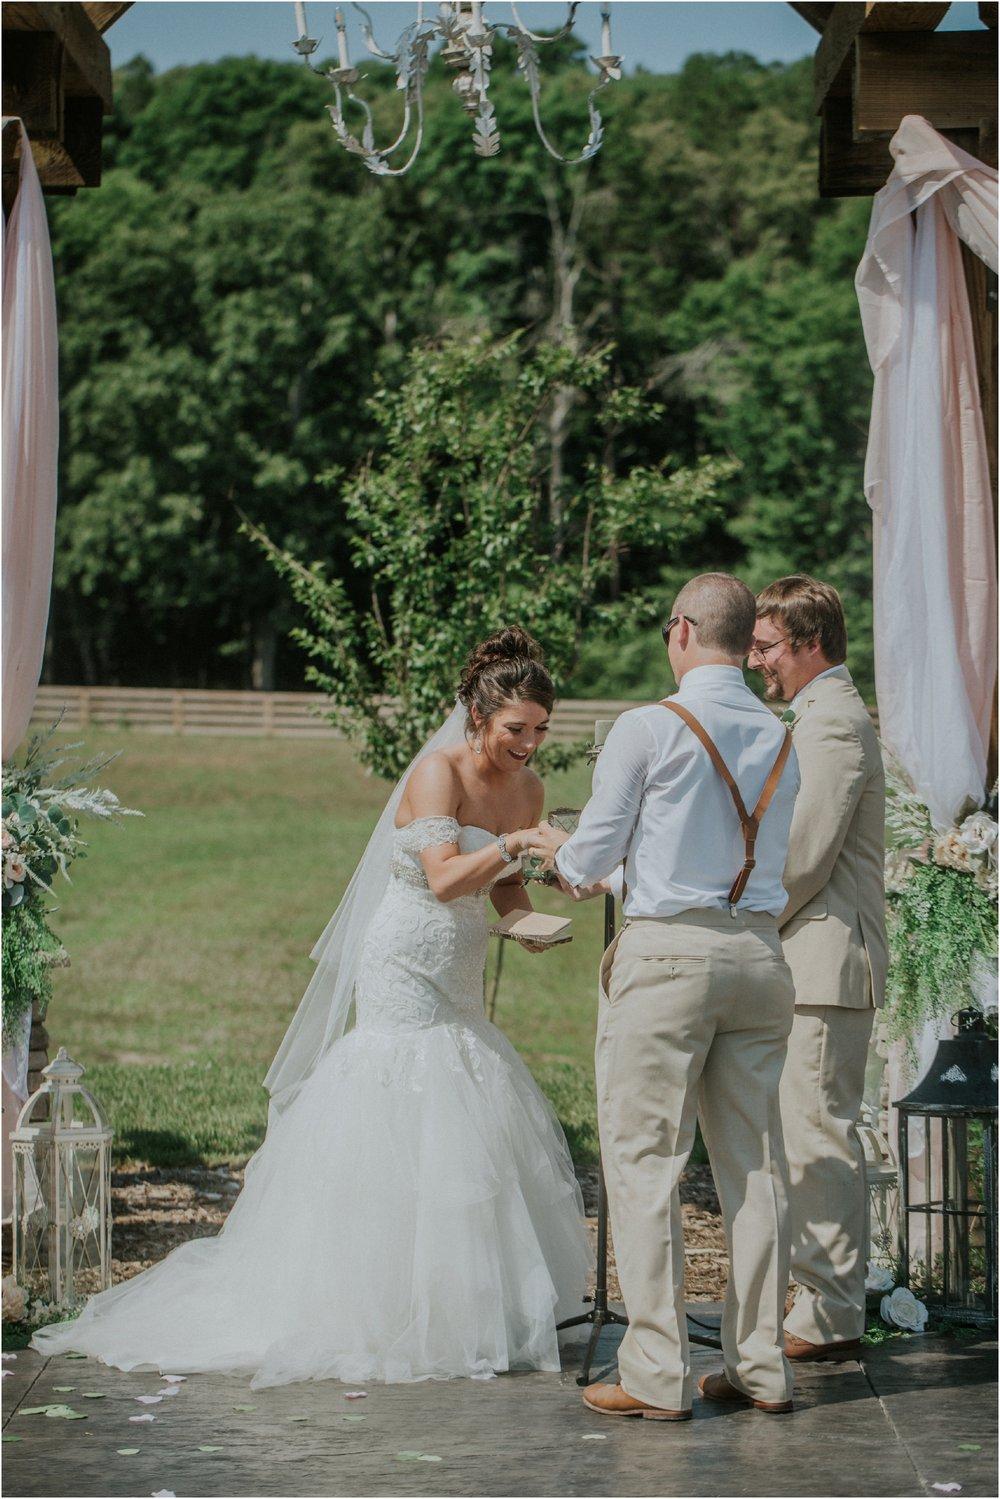 pink-rustic-apple-barn-howe-farms-elegant-summer-wedding-cleveland-tennessee-chattanooga-georgetown-tn_0114.jpg